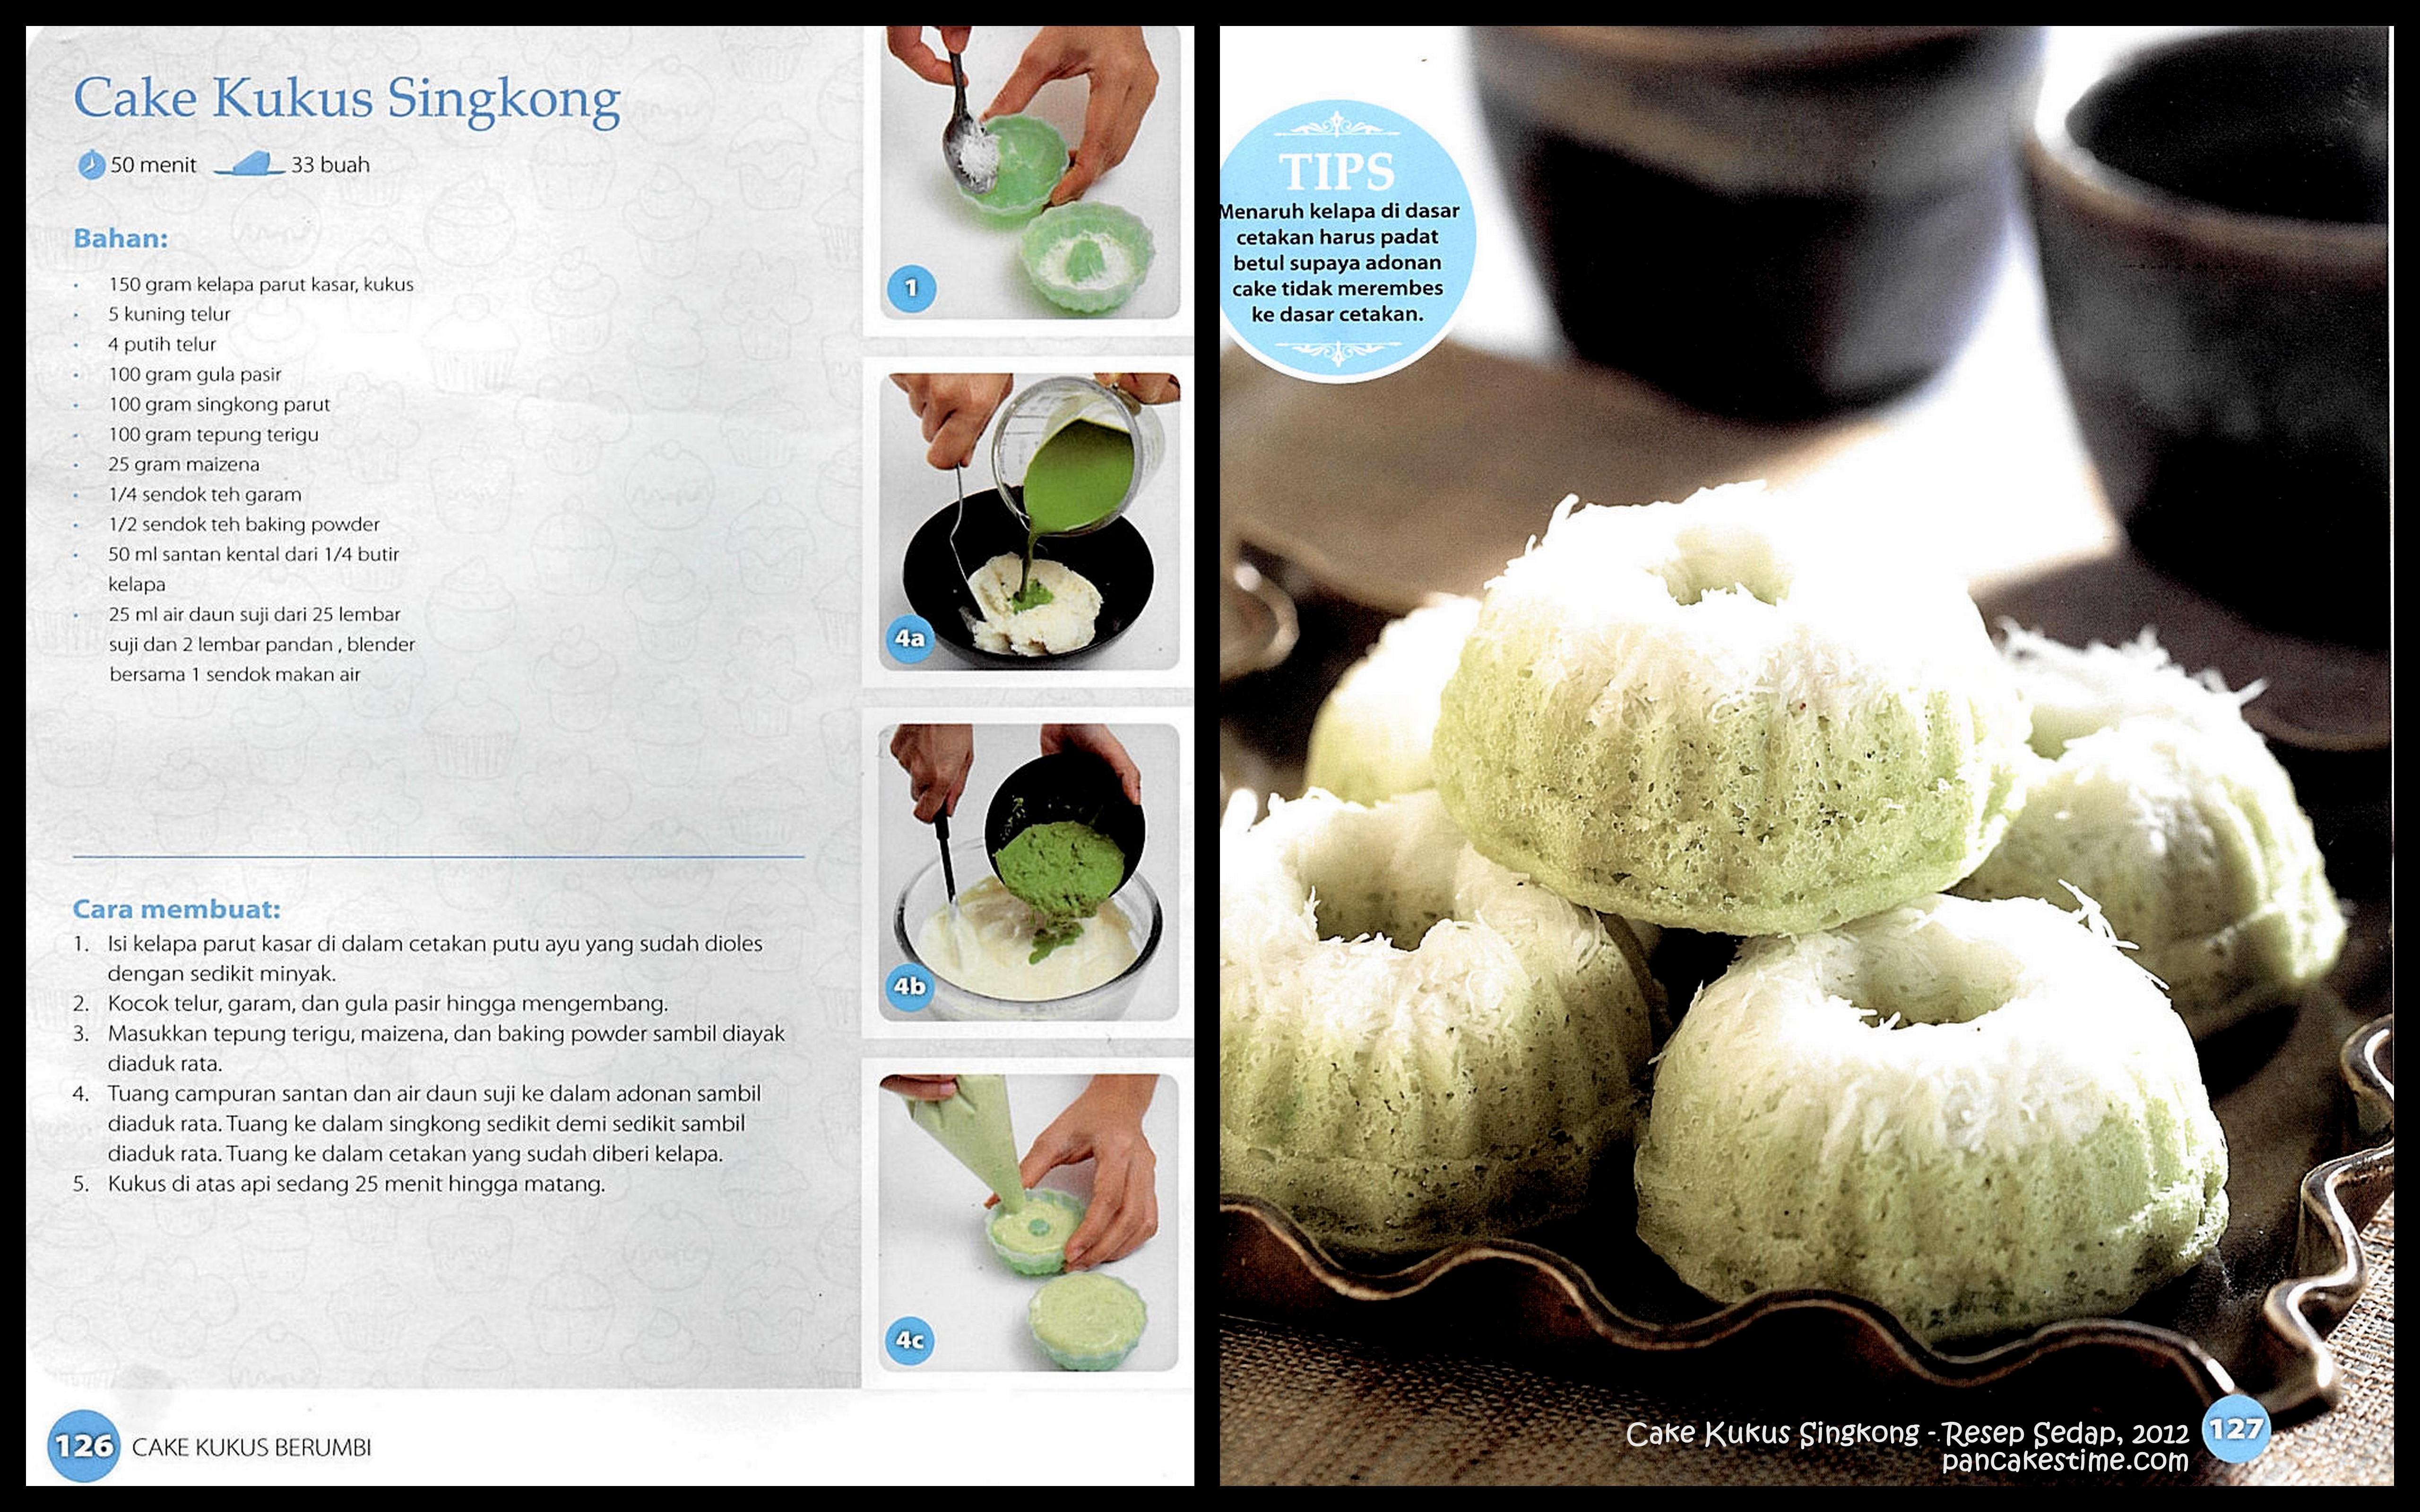 Resep Cake Kukus Pelangi Ncc: Bolu Kukus Pandan Cake Ideas And Designs